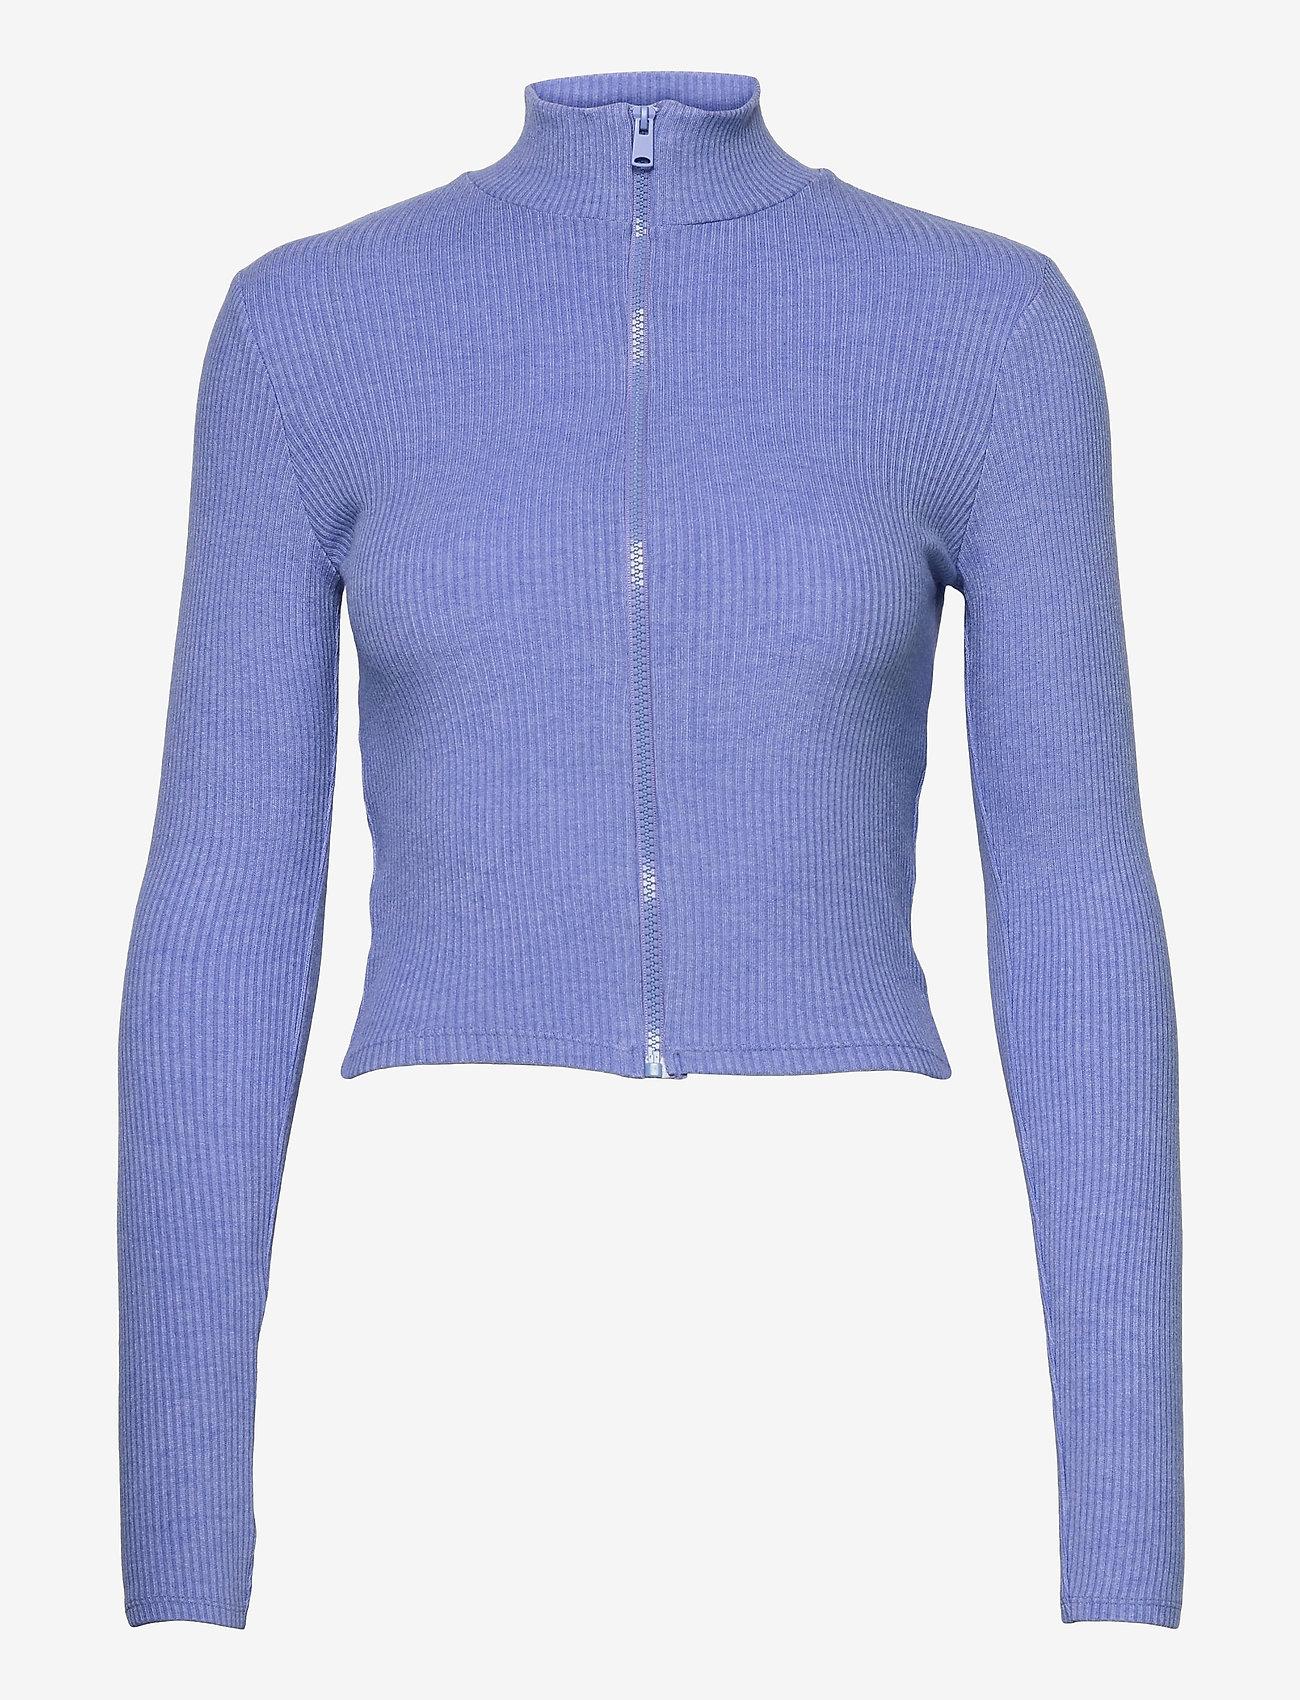 Gina Tricot - Eloise zip top - strikkede toppe - blue bonnet (5138) - 0